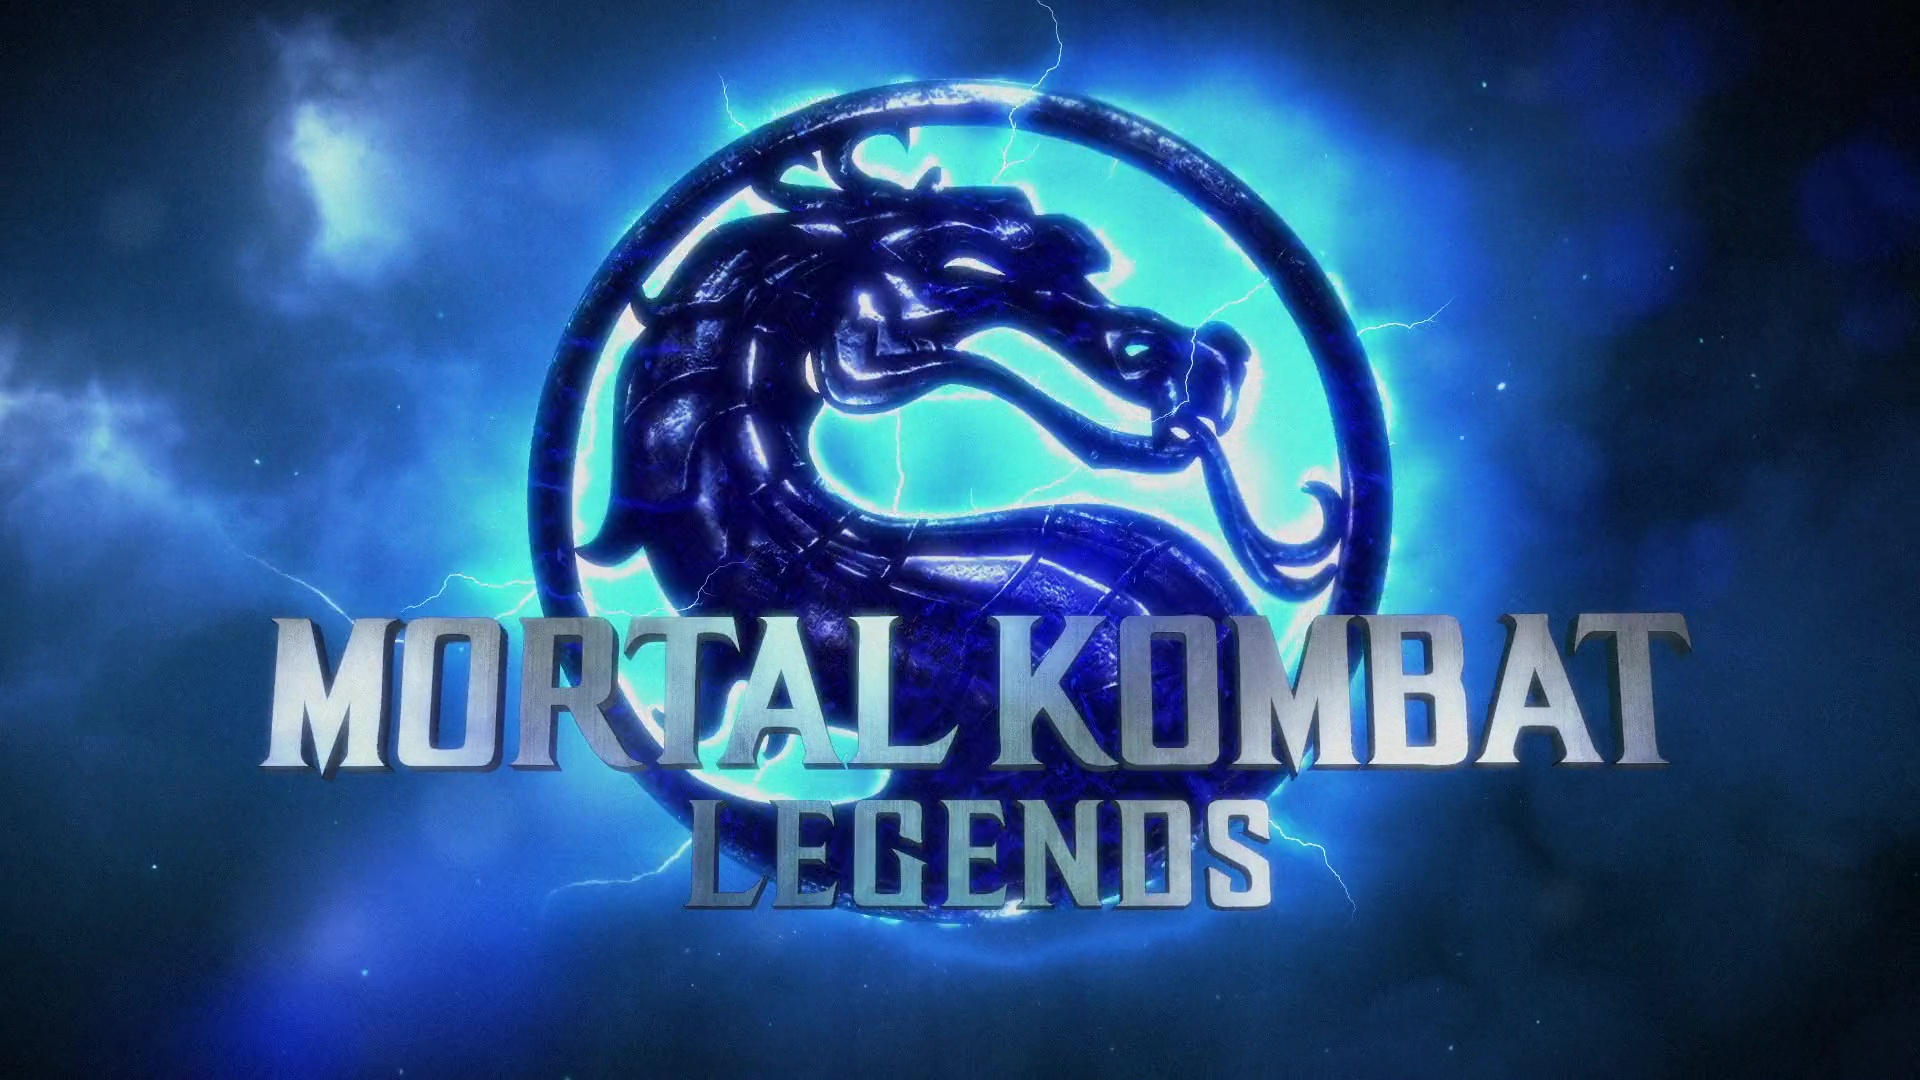 Mortal Kombat Leyendas: La batalla de los reinos (2021) 1080p WEB-DL Latino